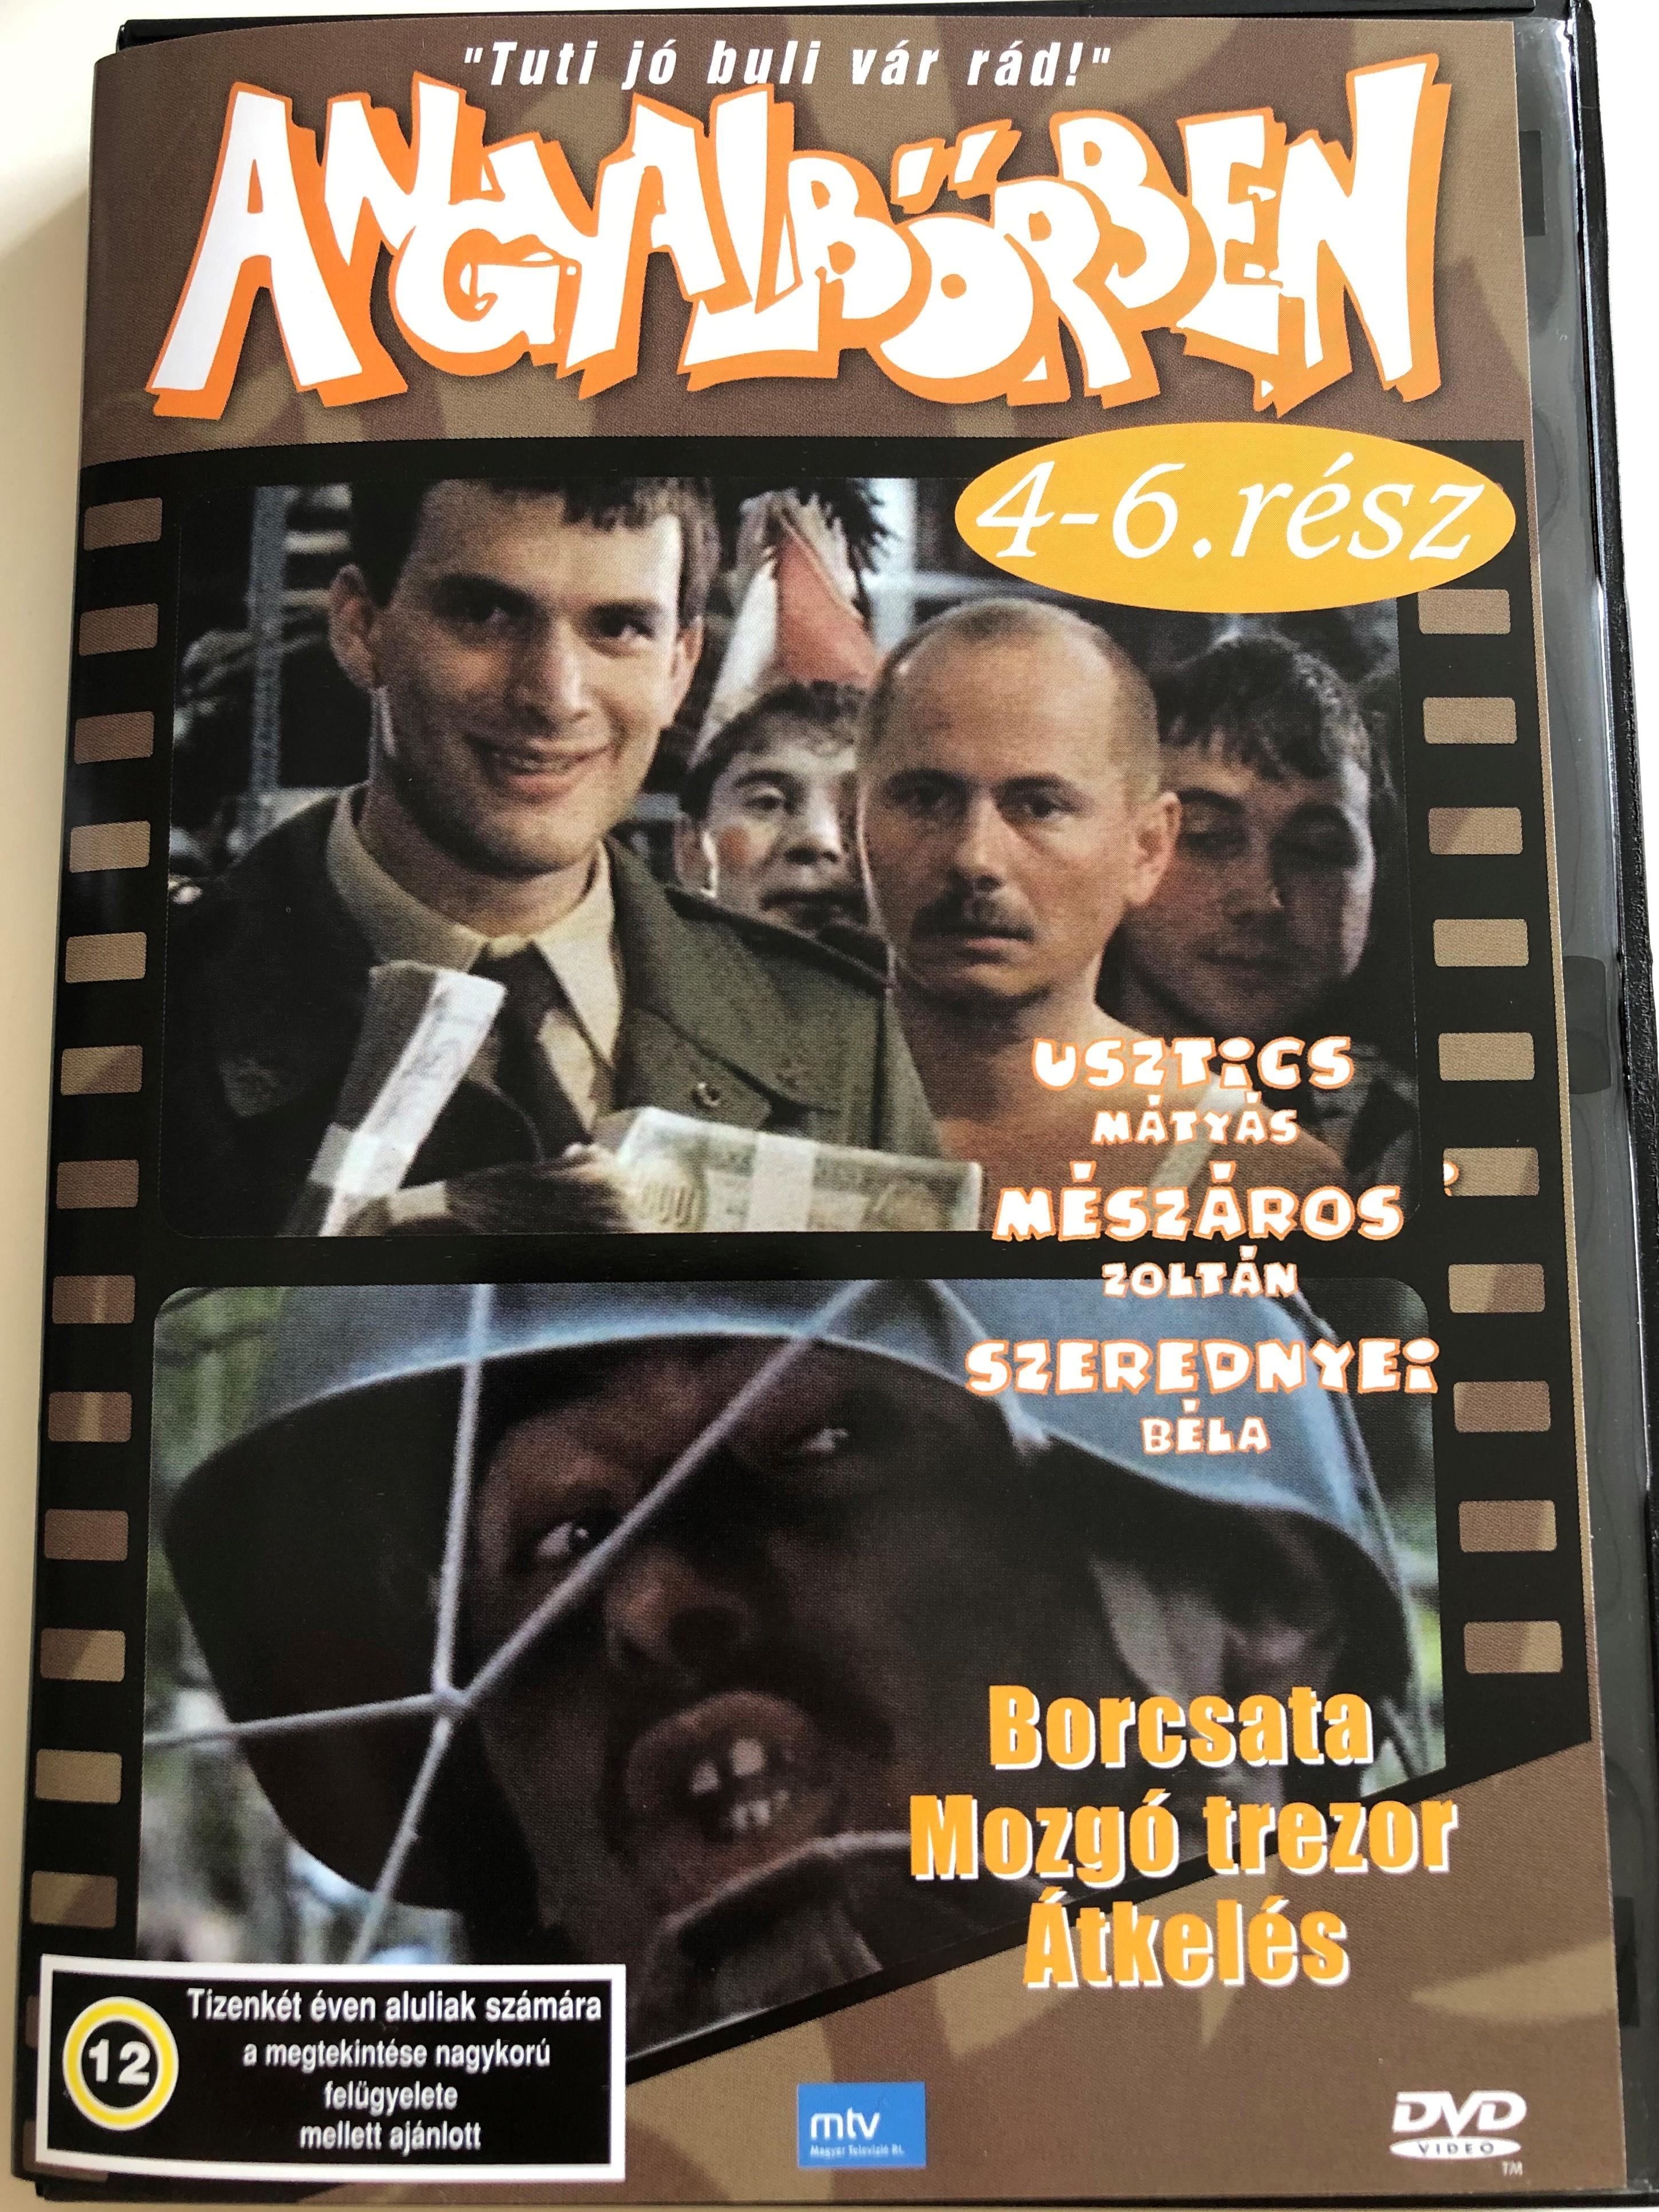 angyalb-rben-1991-directed-by-g-t-gy-rgy-szurdi-mikl-s-starring-usztics-m-ty-s-m-sz-ros-zolt-n-szerednyei-b-la-hungarian-tv-series-3-episodes-on-dvd-1-.jpg